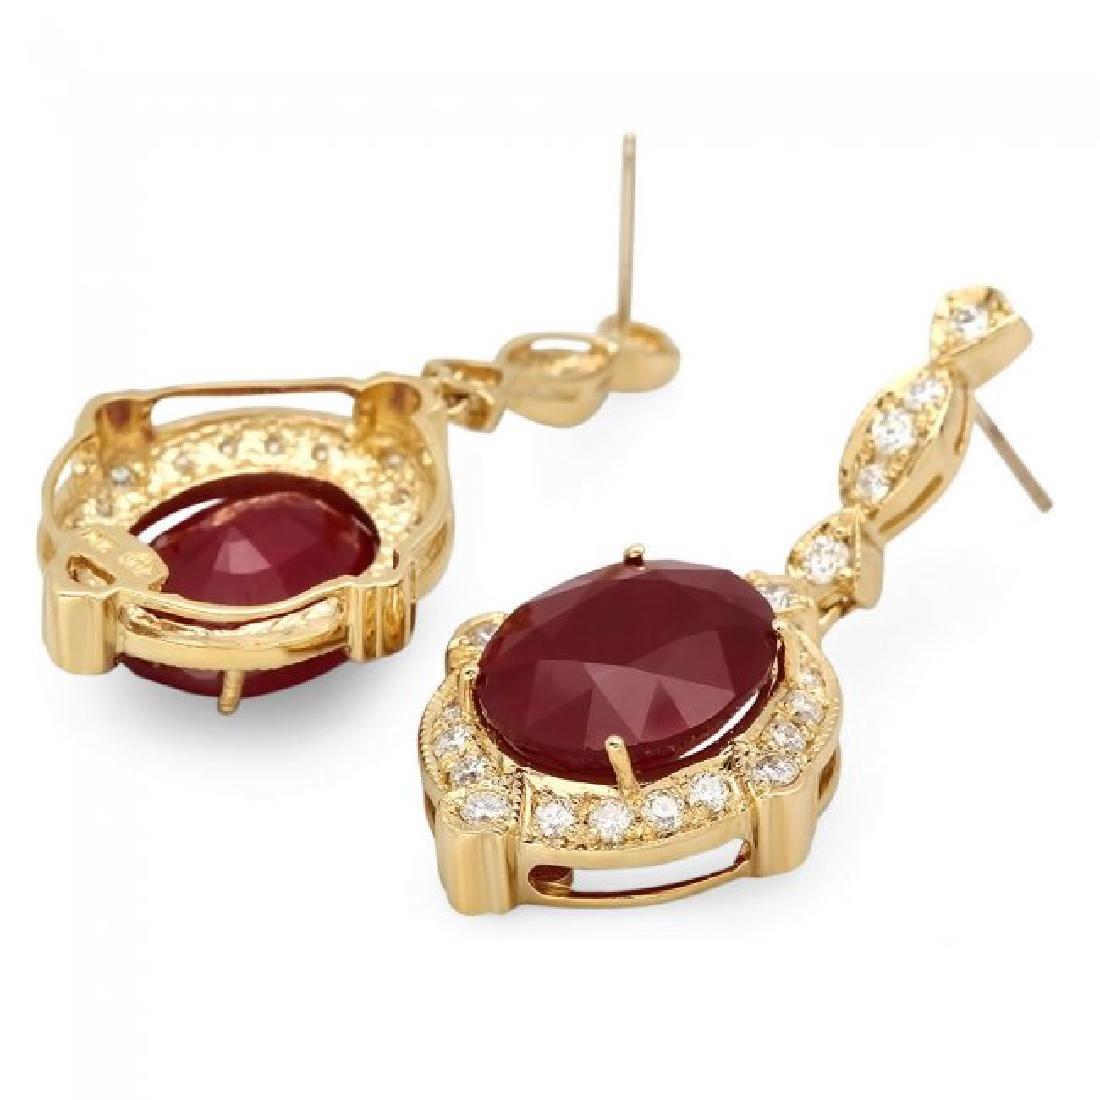 14k Gold 22.50ct Ruby 1.70ct Diamond Earrings - 2